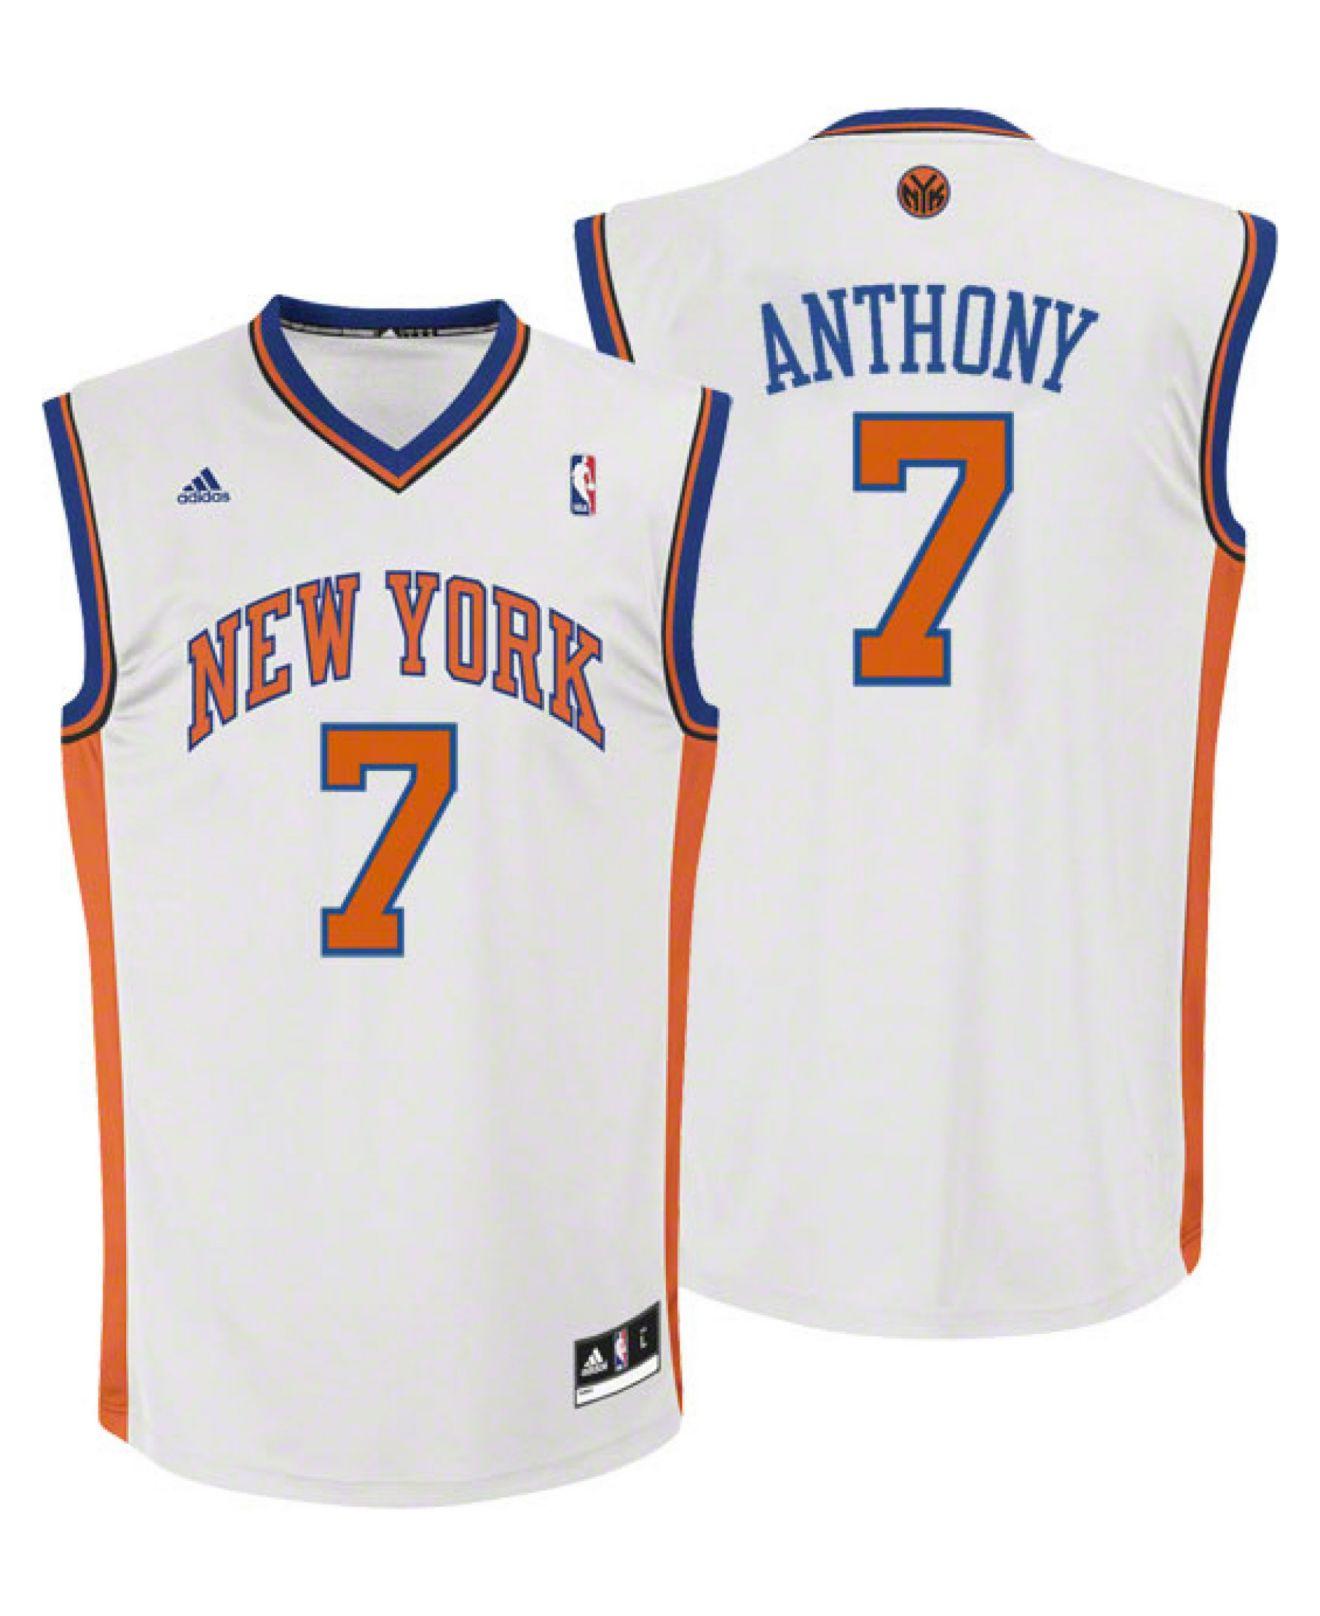 Carmelo Anthony Pistons Jersey: Adidas Kids' Carmelo Anthony New York Knicks